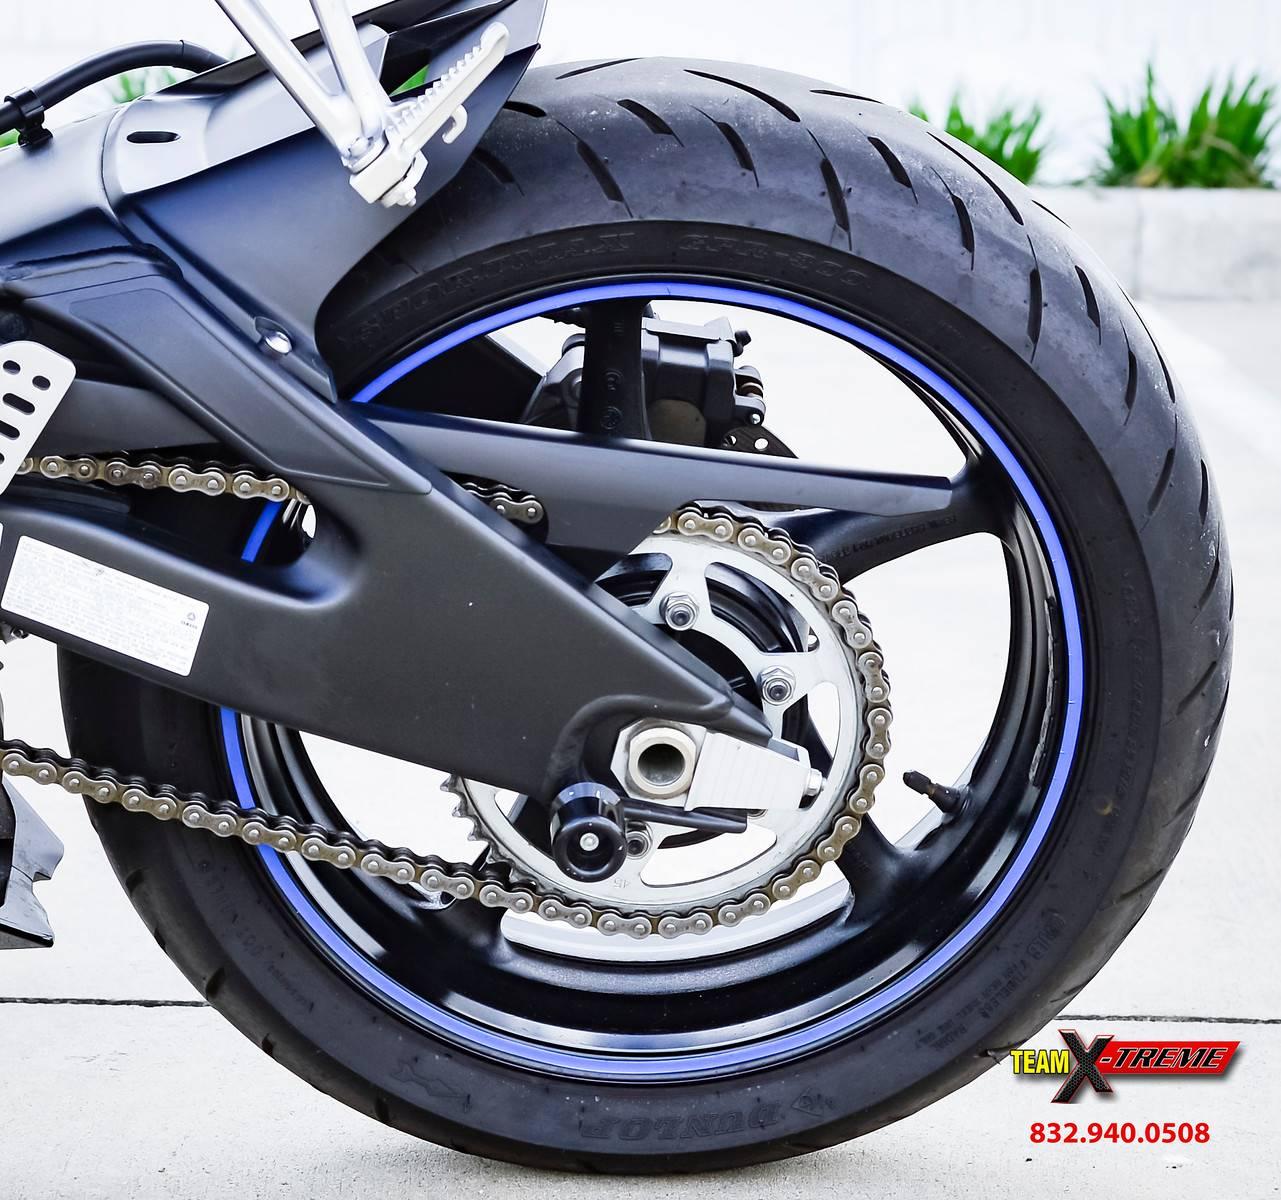 2009 Yamaha YZFR6 8